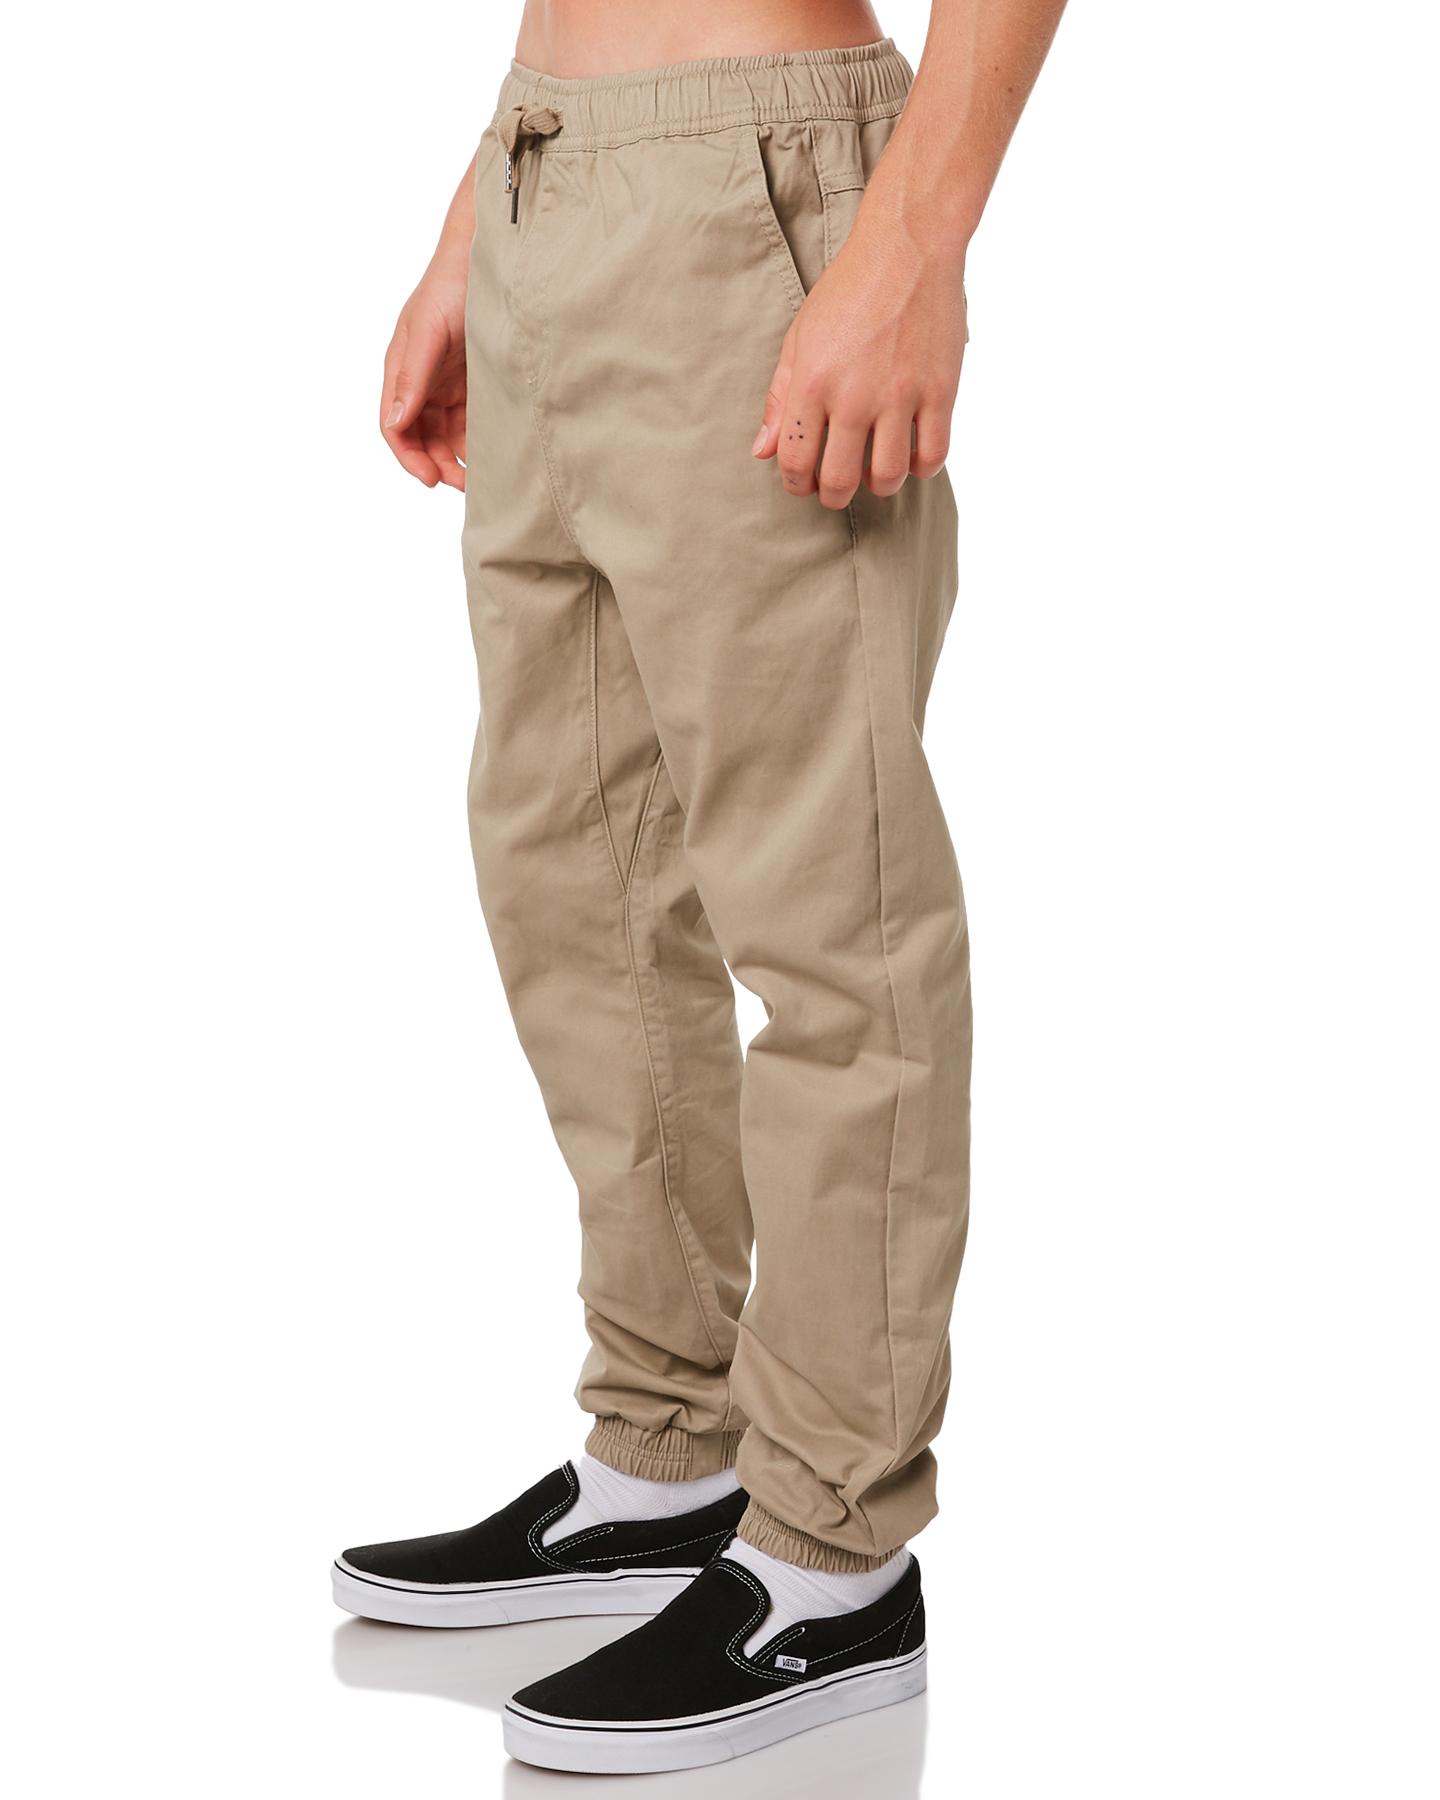 New-Swell-Boys-Kids-Boys-Cartel-Pant-Cotton-Elastane-Brown